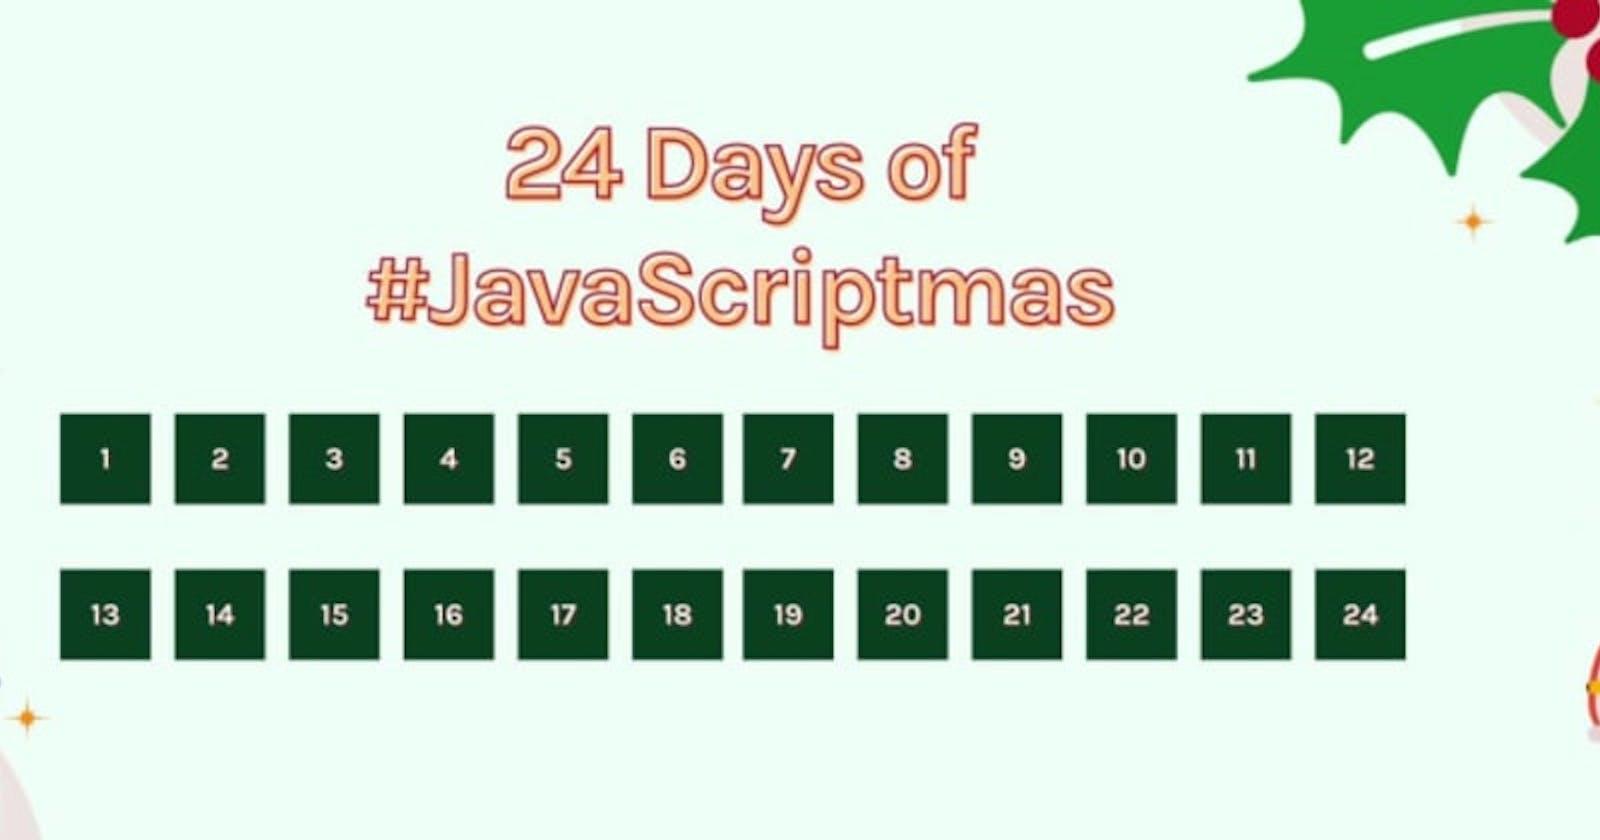 #JavaScriptmas